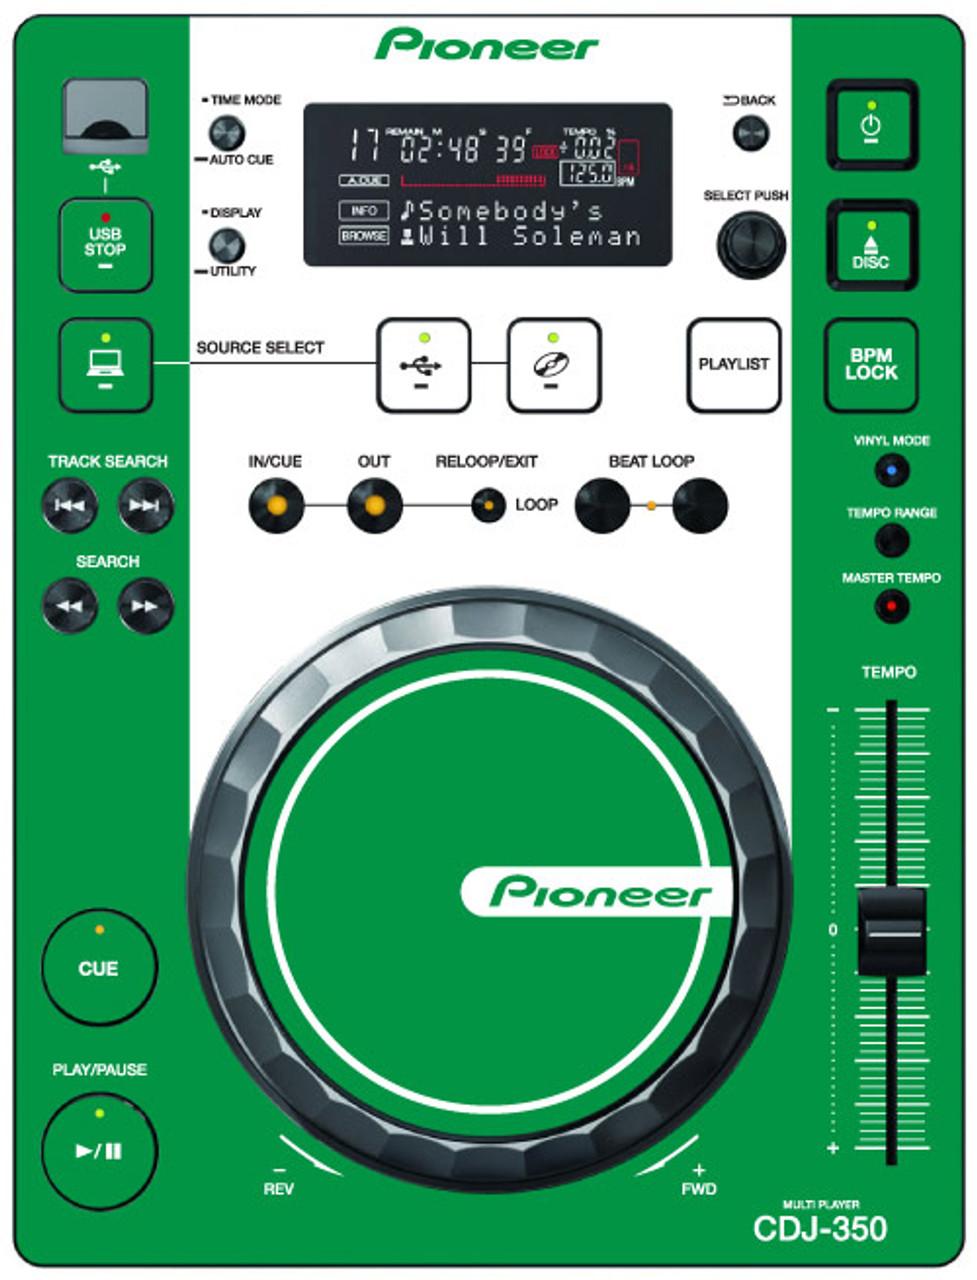 Pioneer CDJ-350 - Green